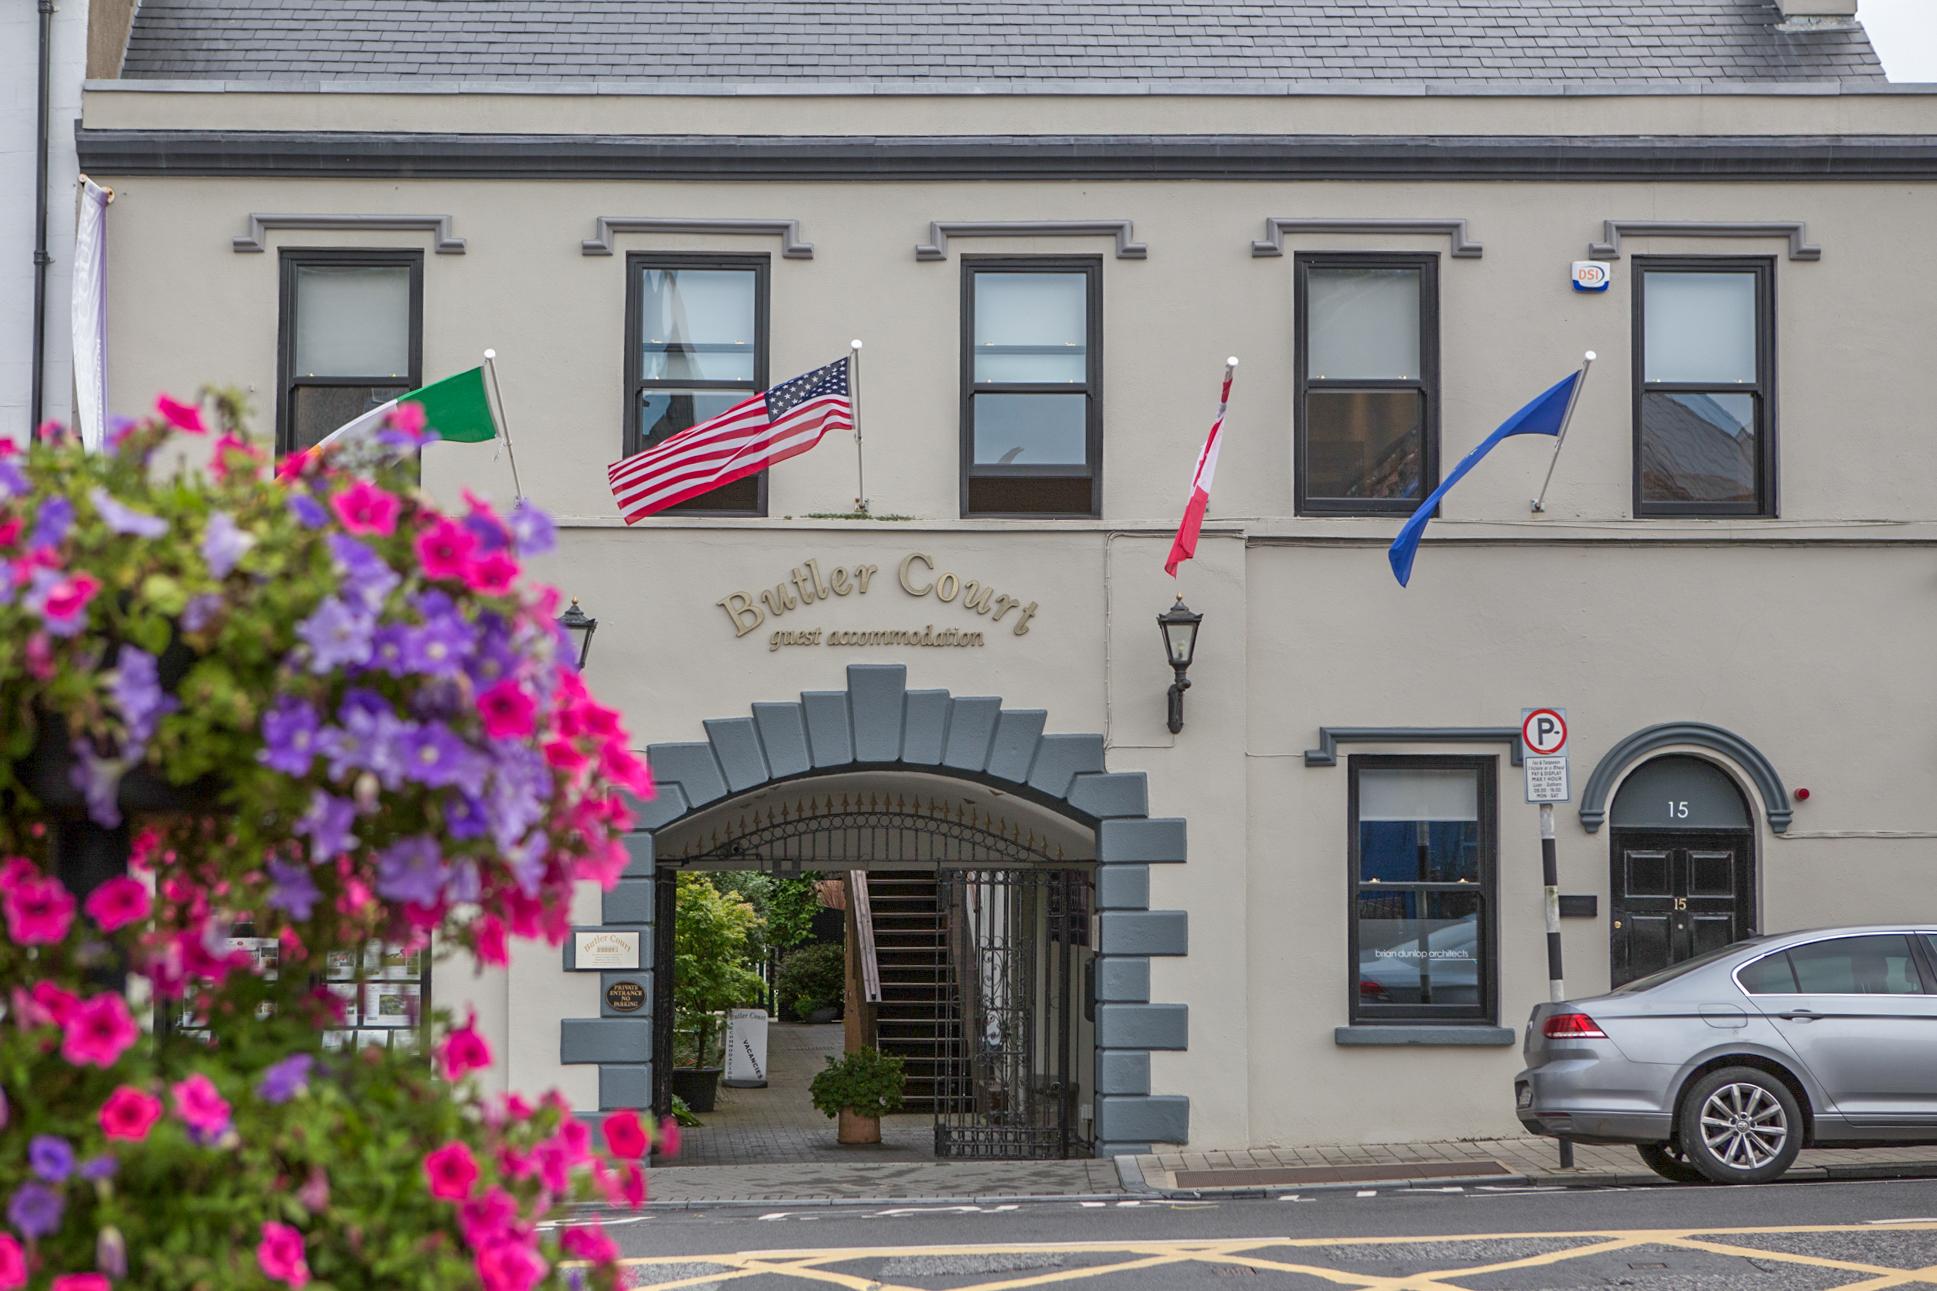 butler court kilkenny guest accommodation